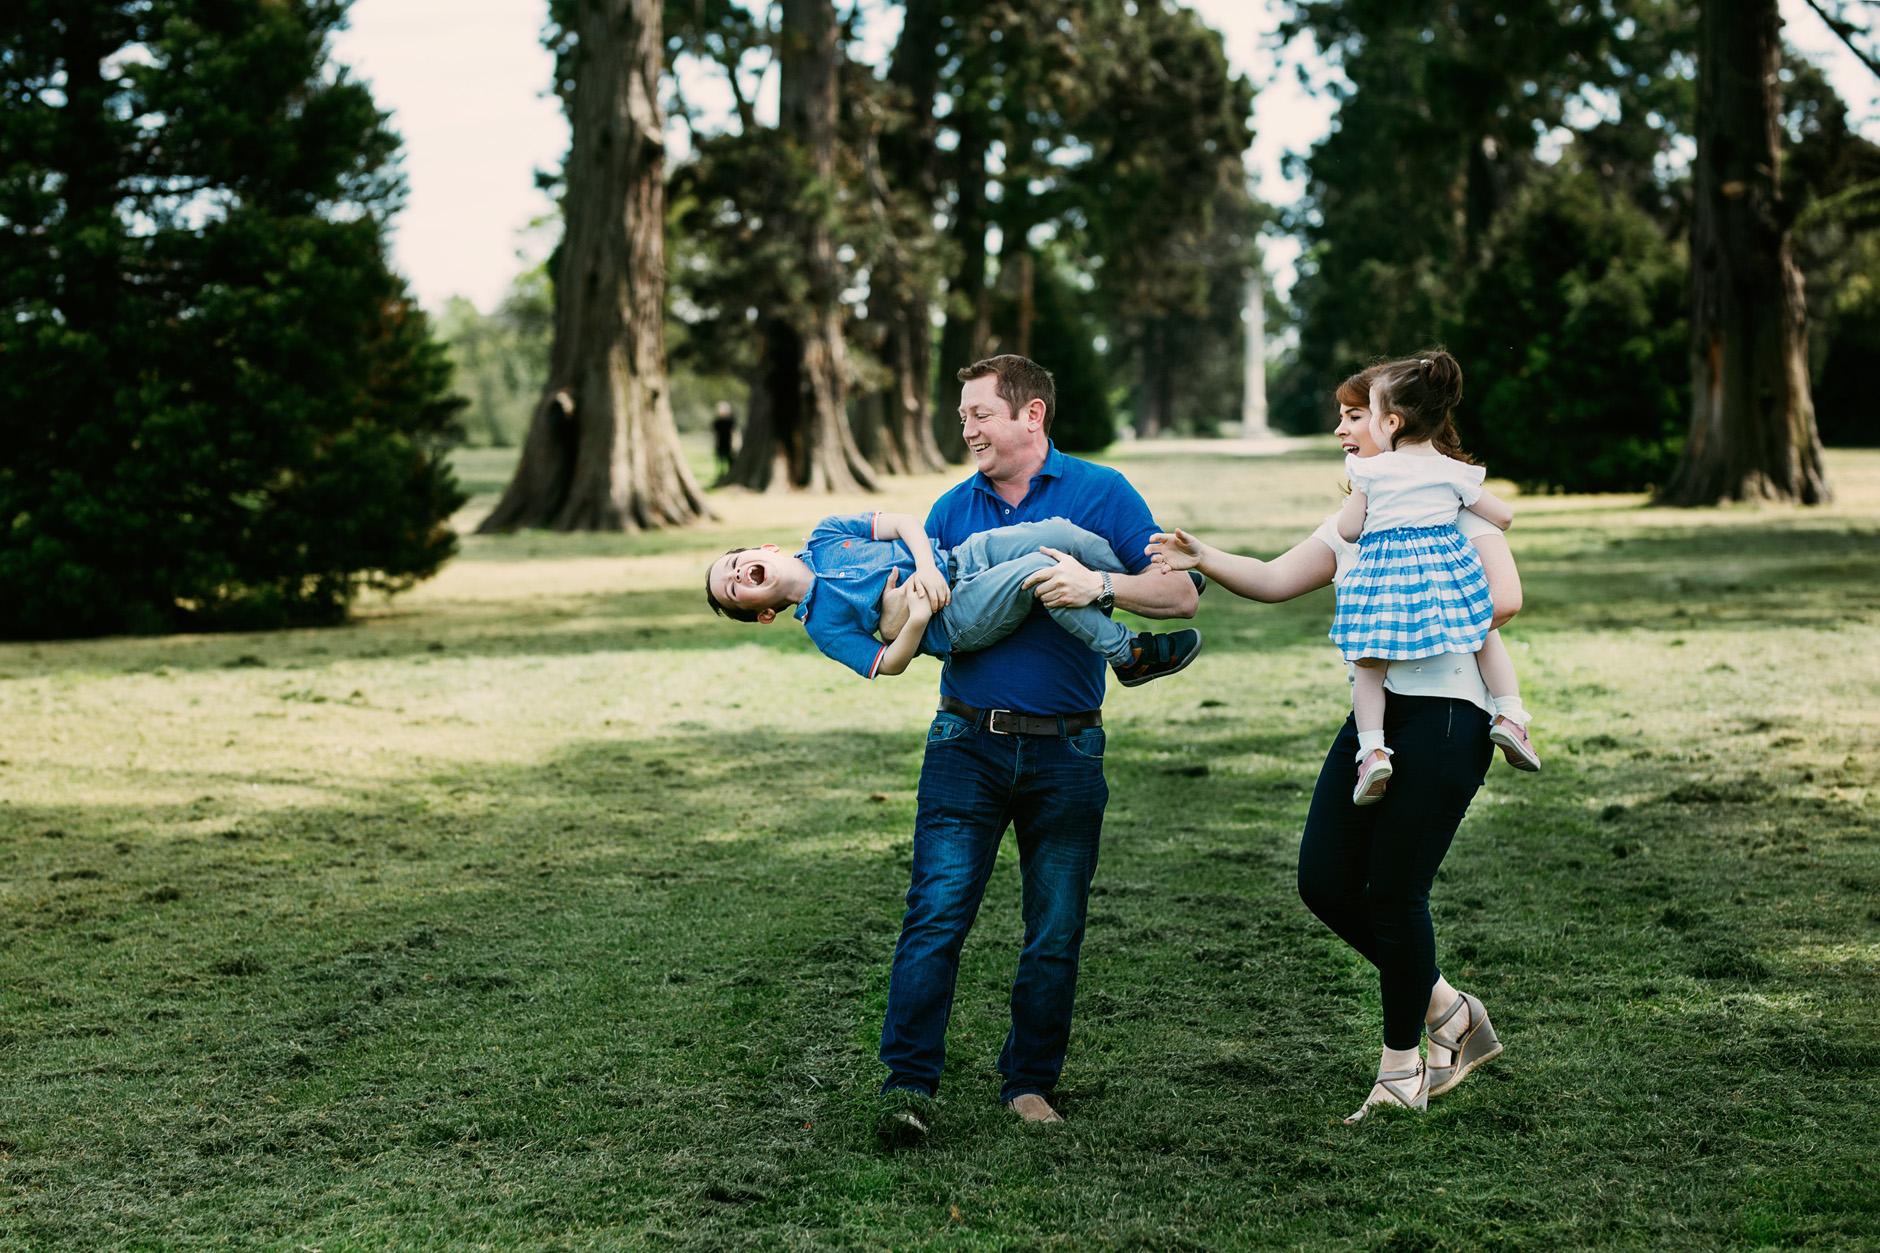 candid-natural-children-family-photographer-dublin-0150.jpg